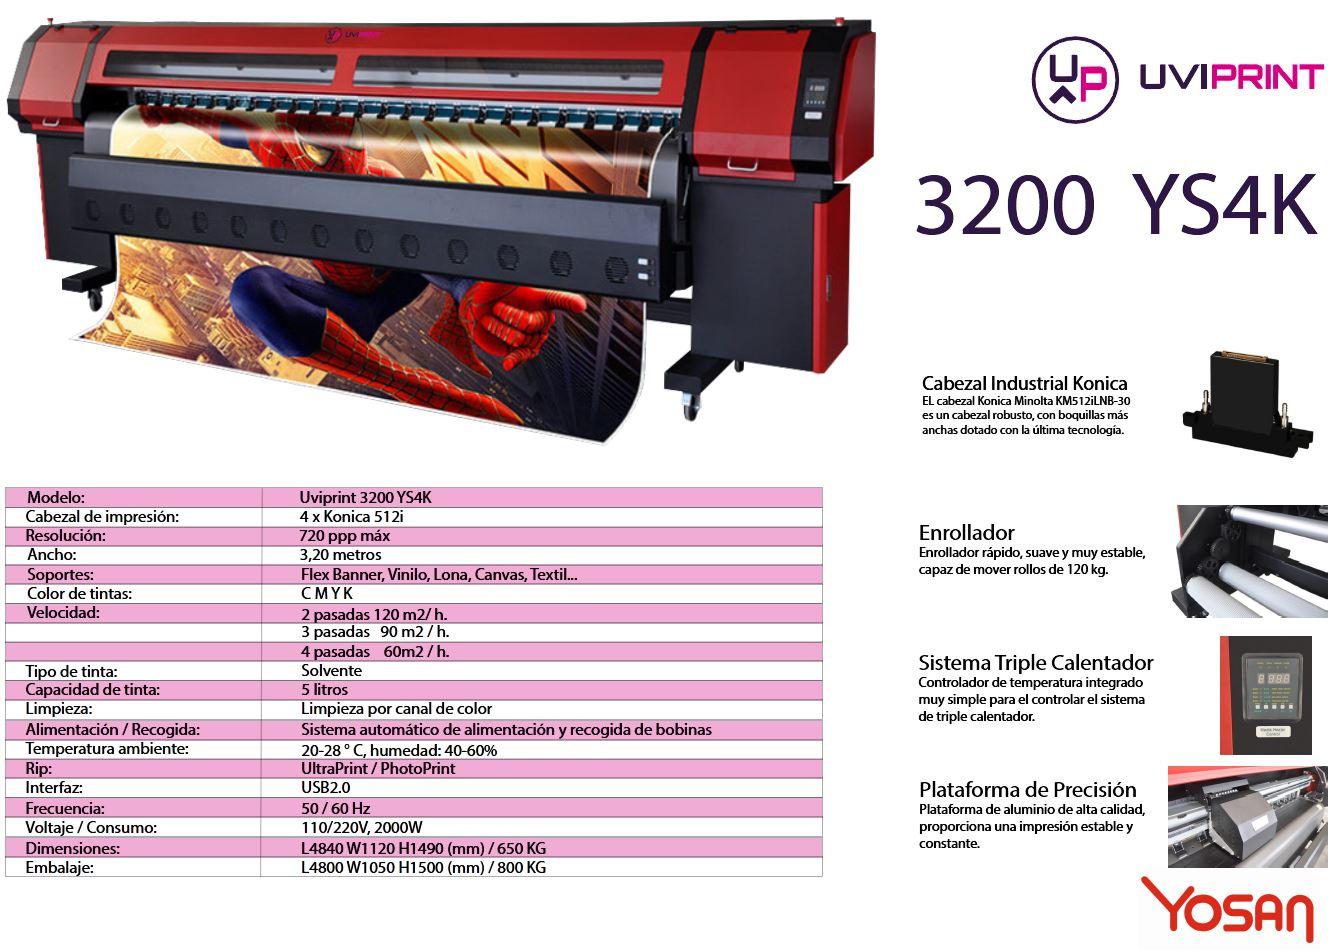 uviprint-3200-ys4k-general gran formato